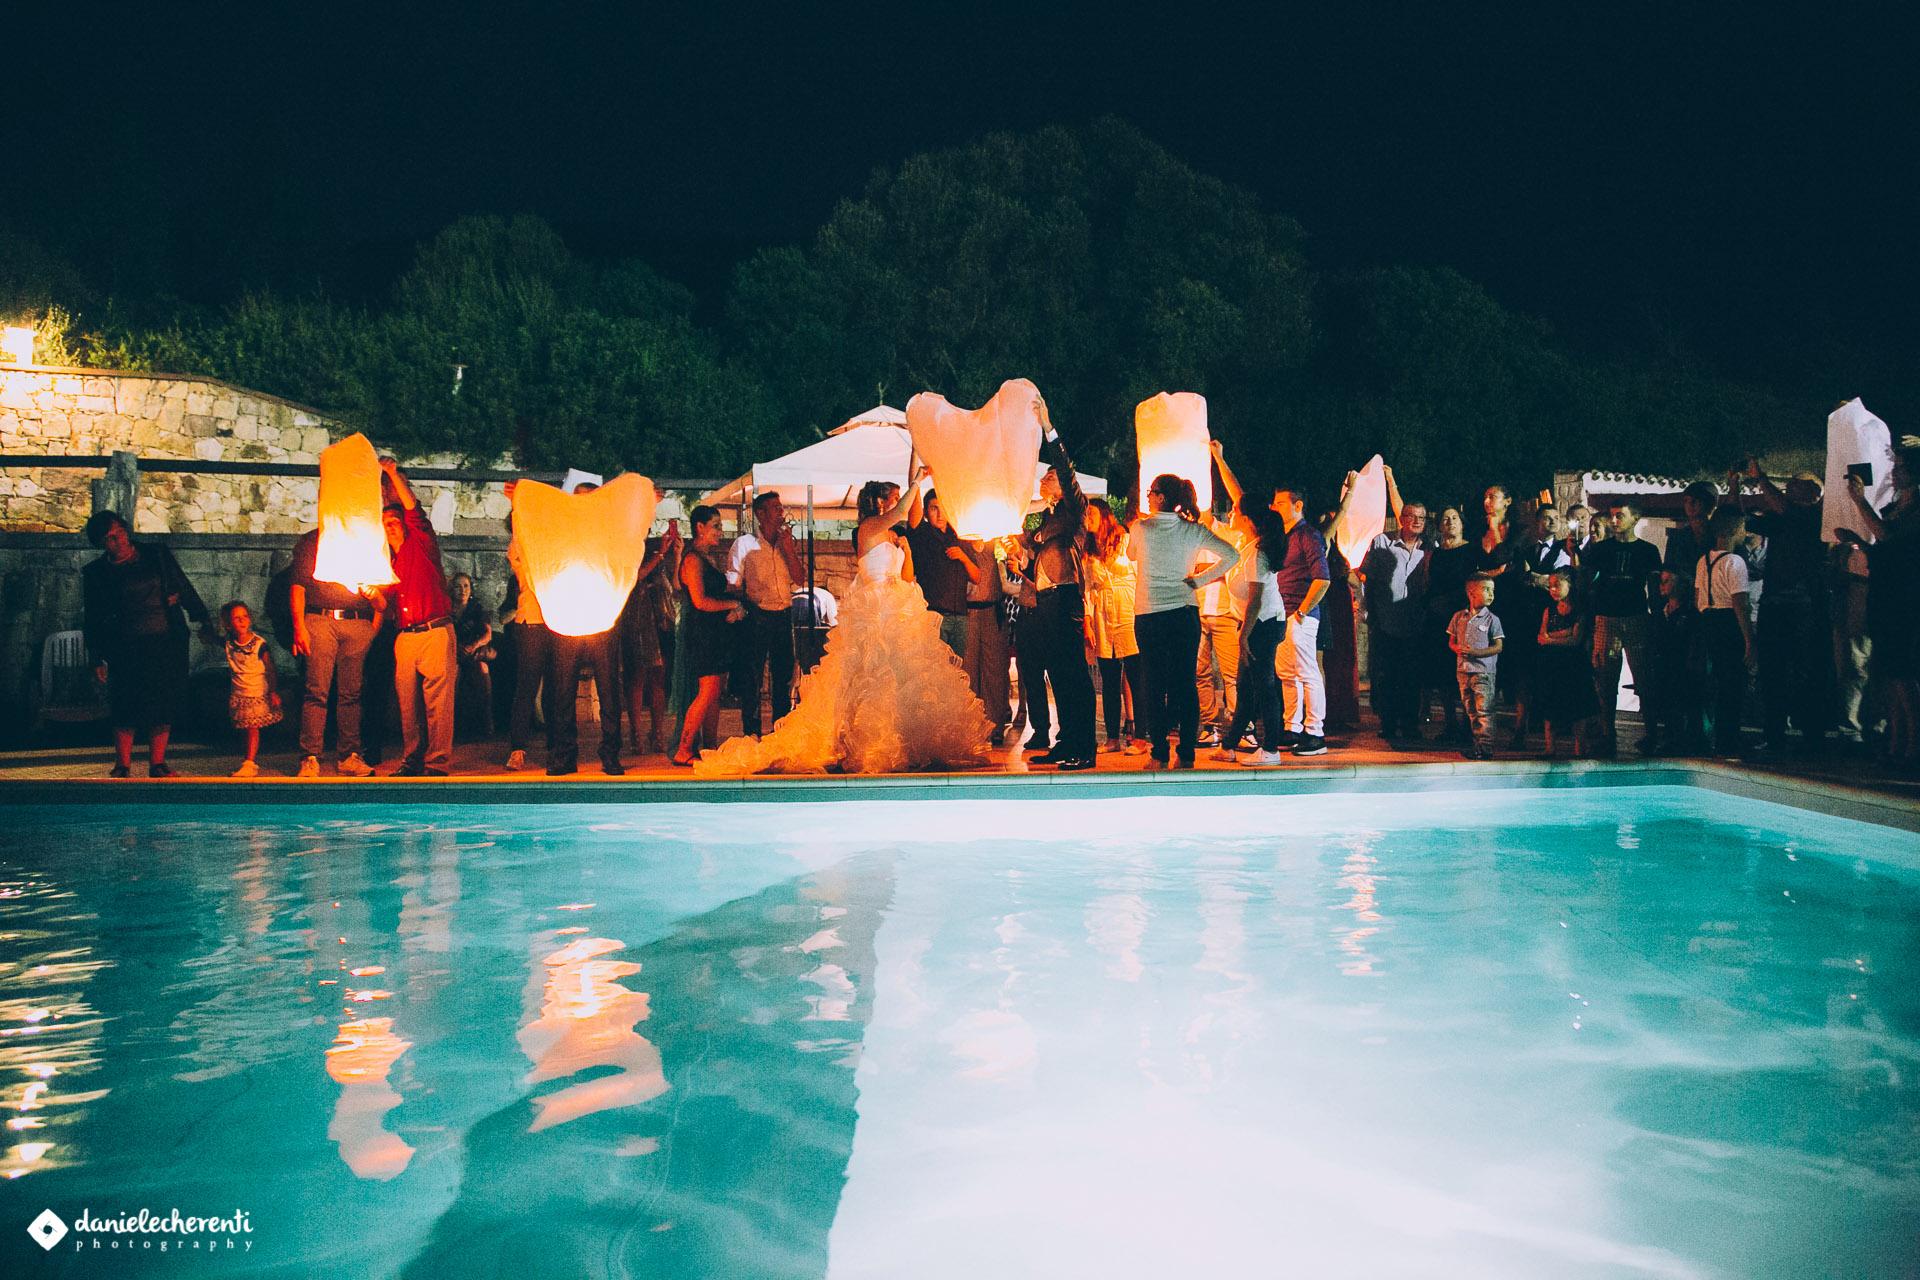 Matrimonio in piscina a Carbonia - Ristorante Tanit - Ristorante a Carbonia dal 1981 - 6